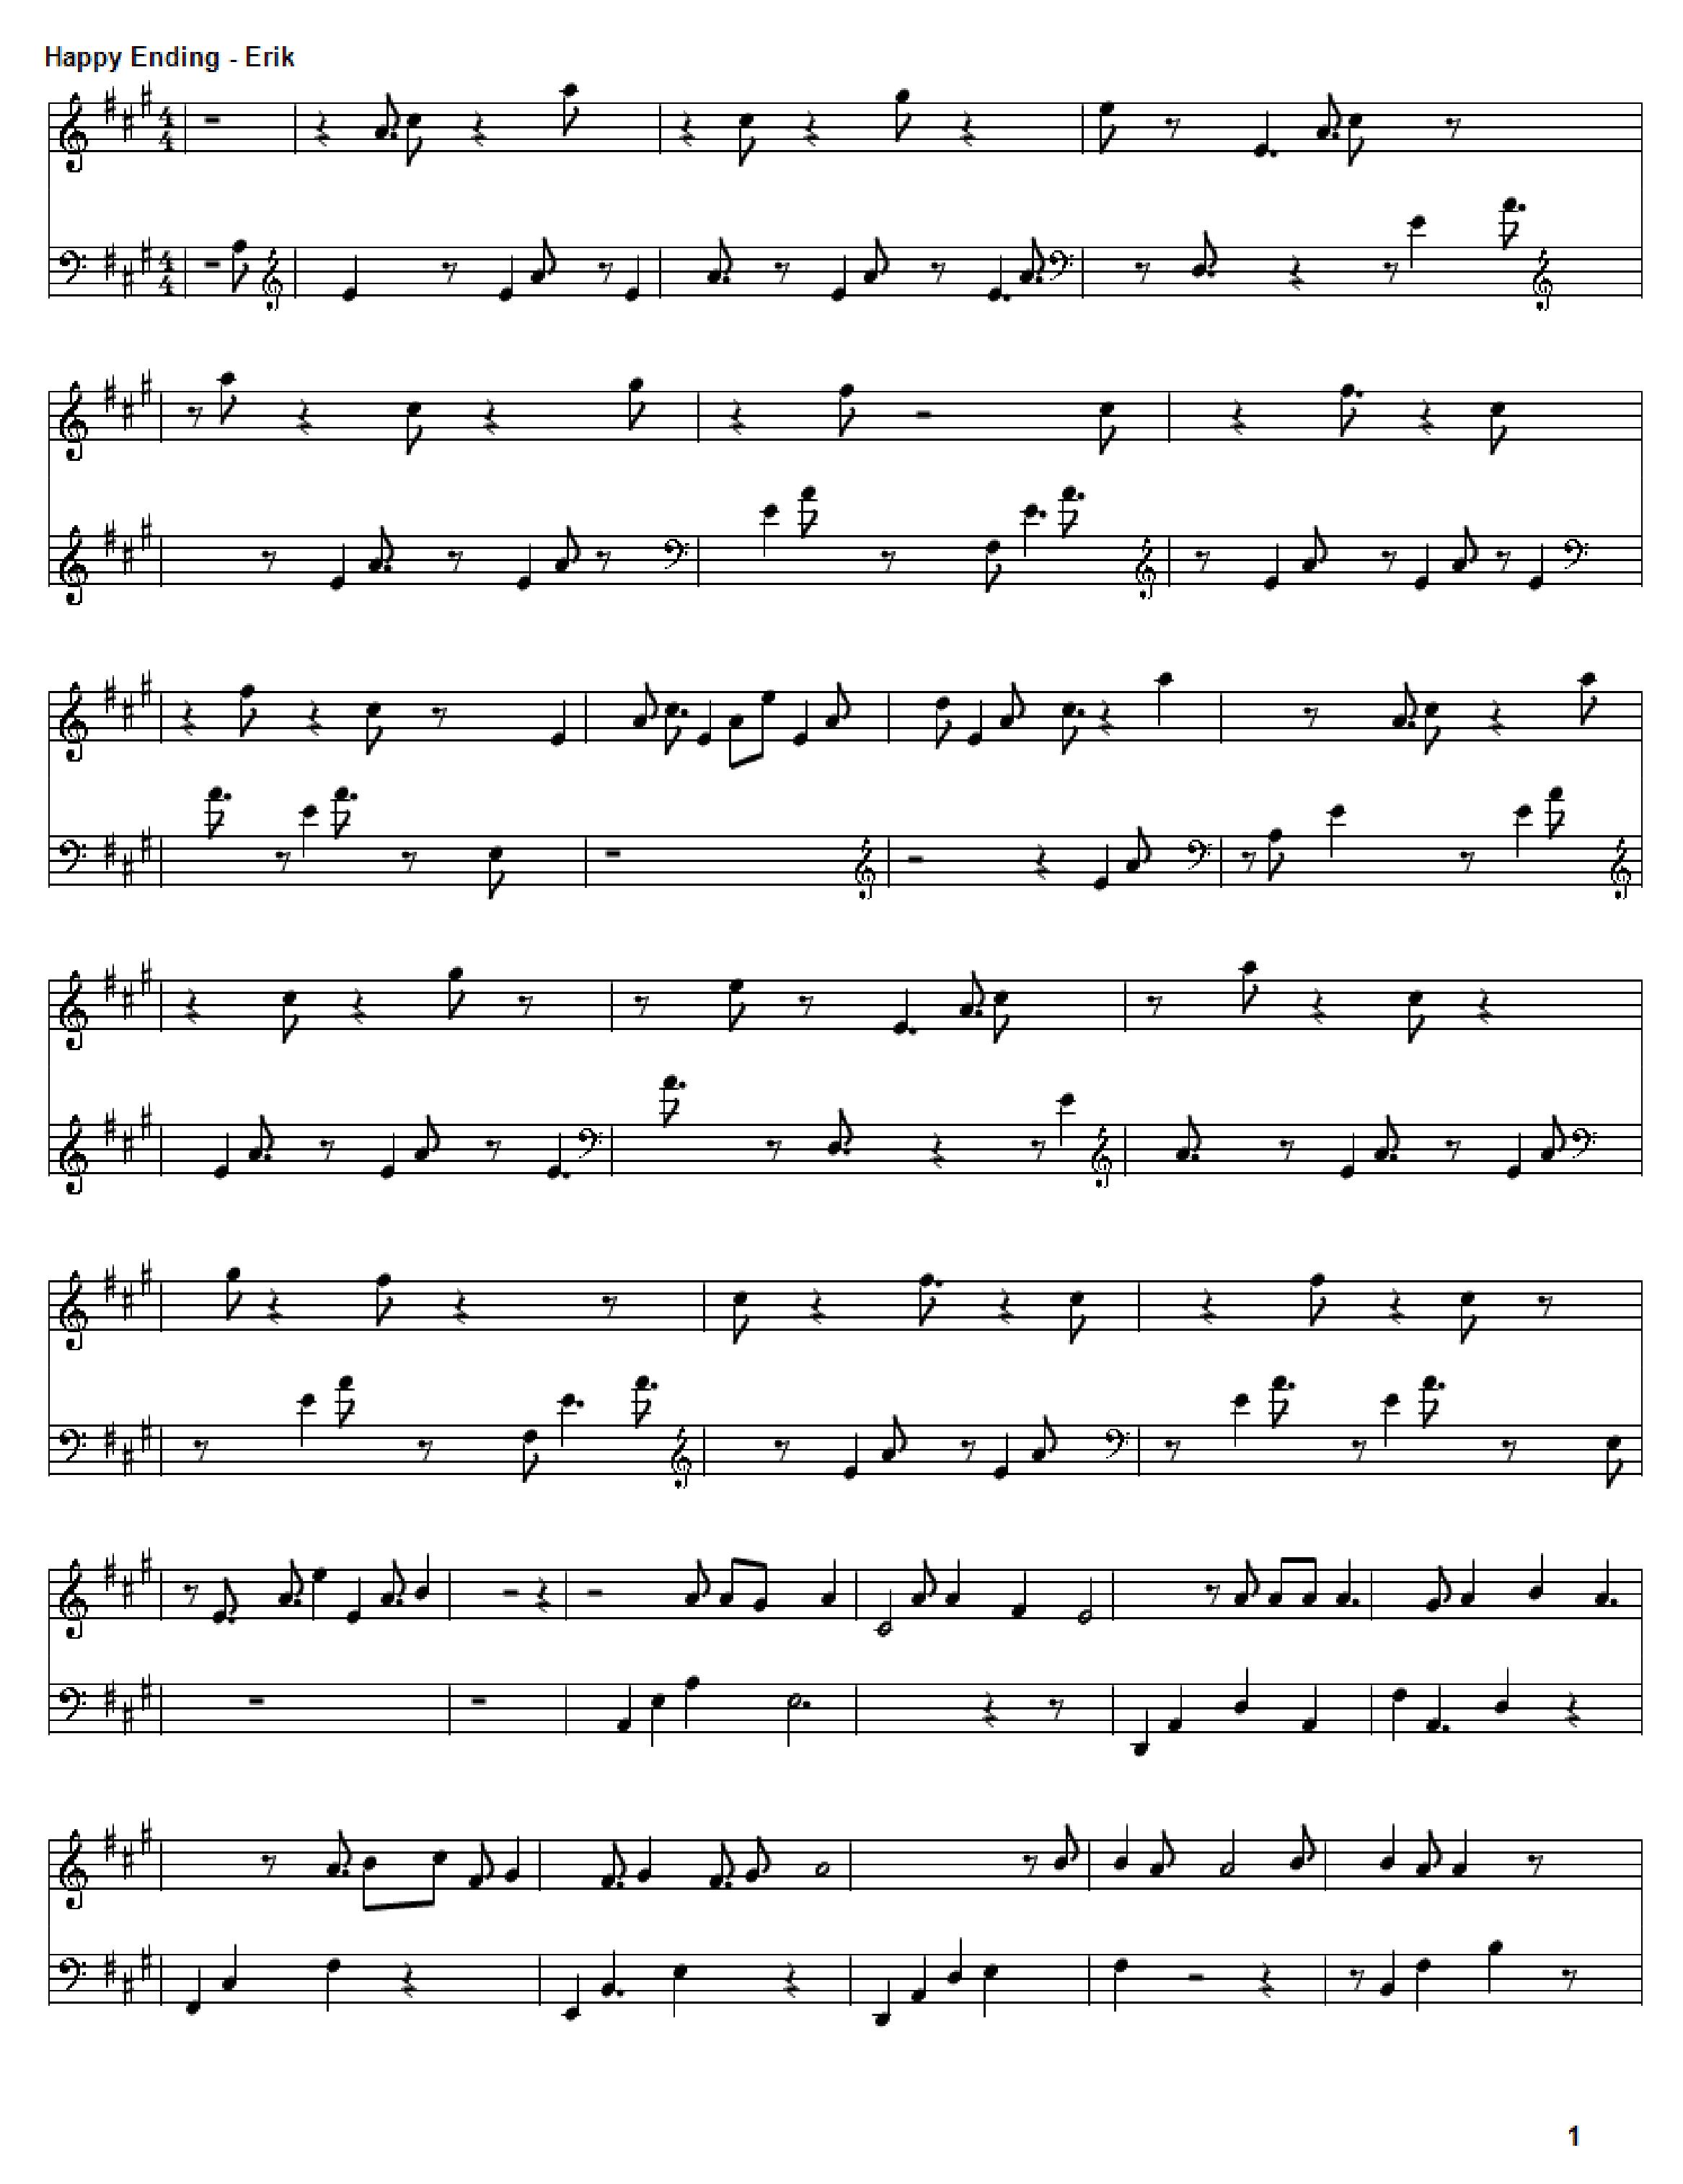 piano-sheet-happy-ending-erik